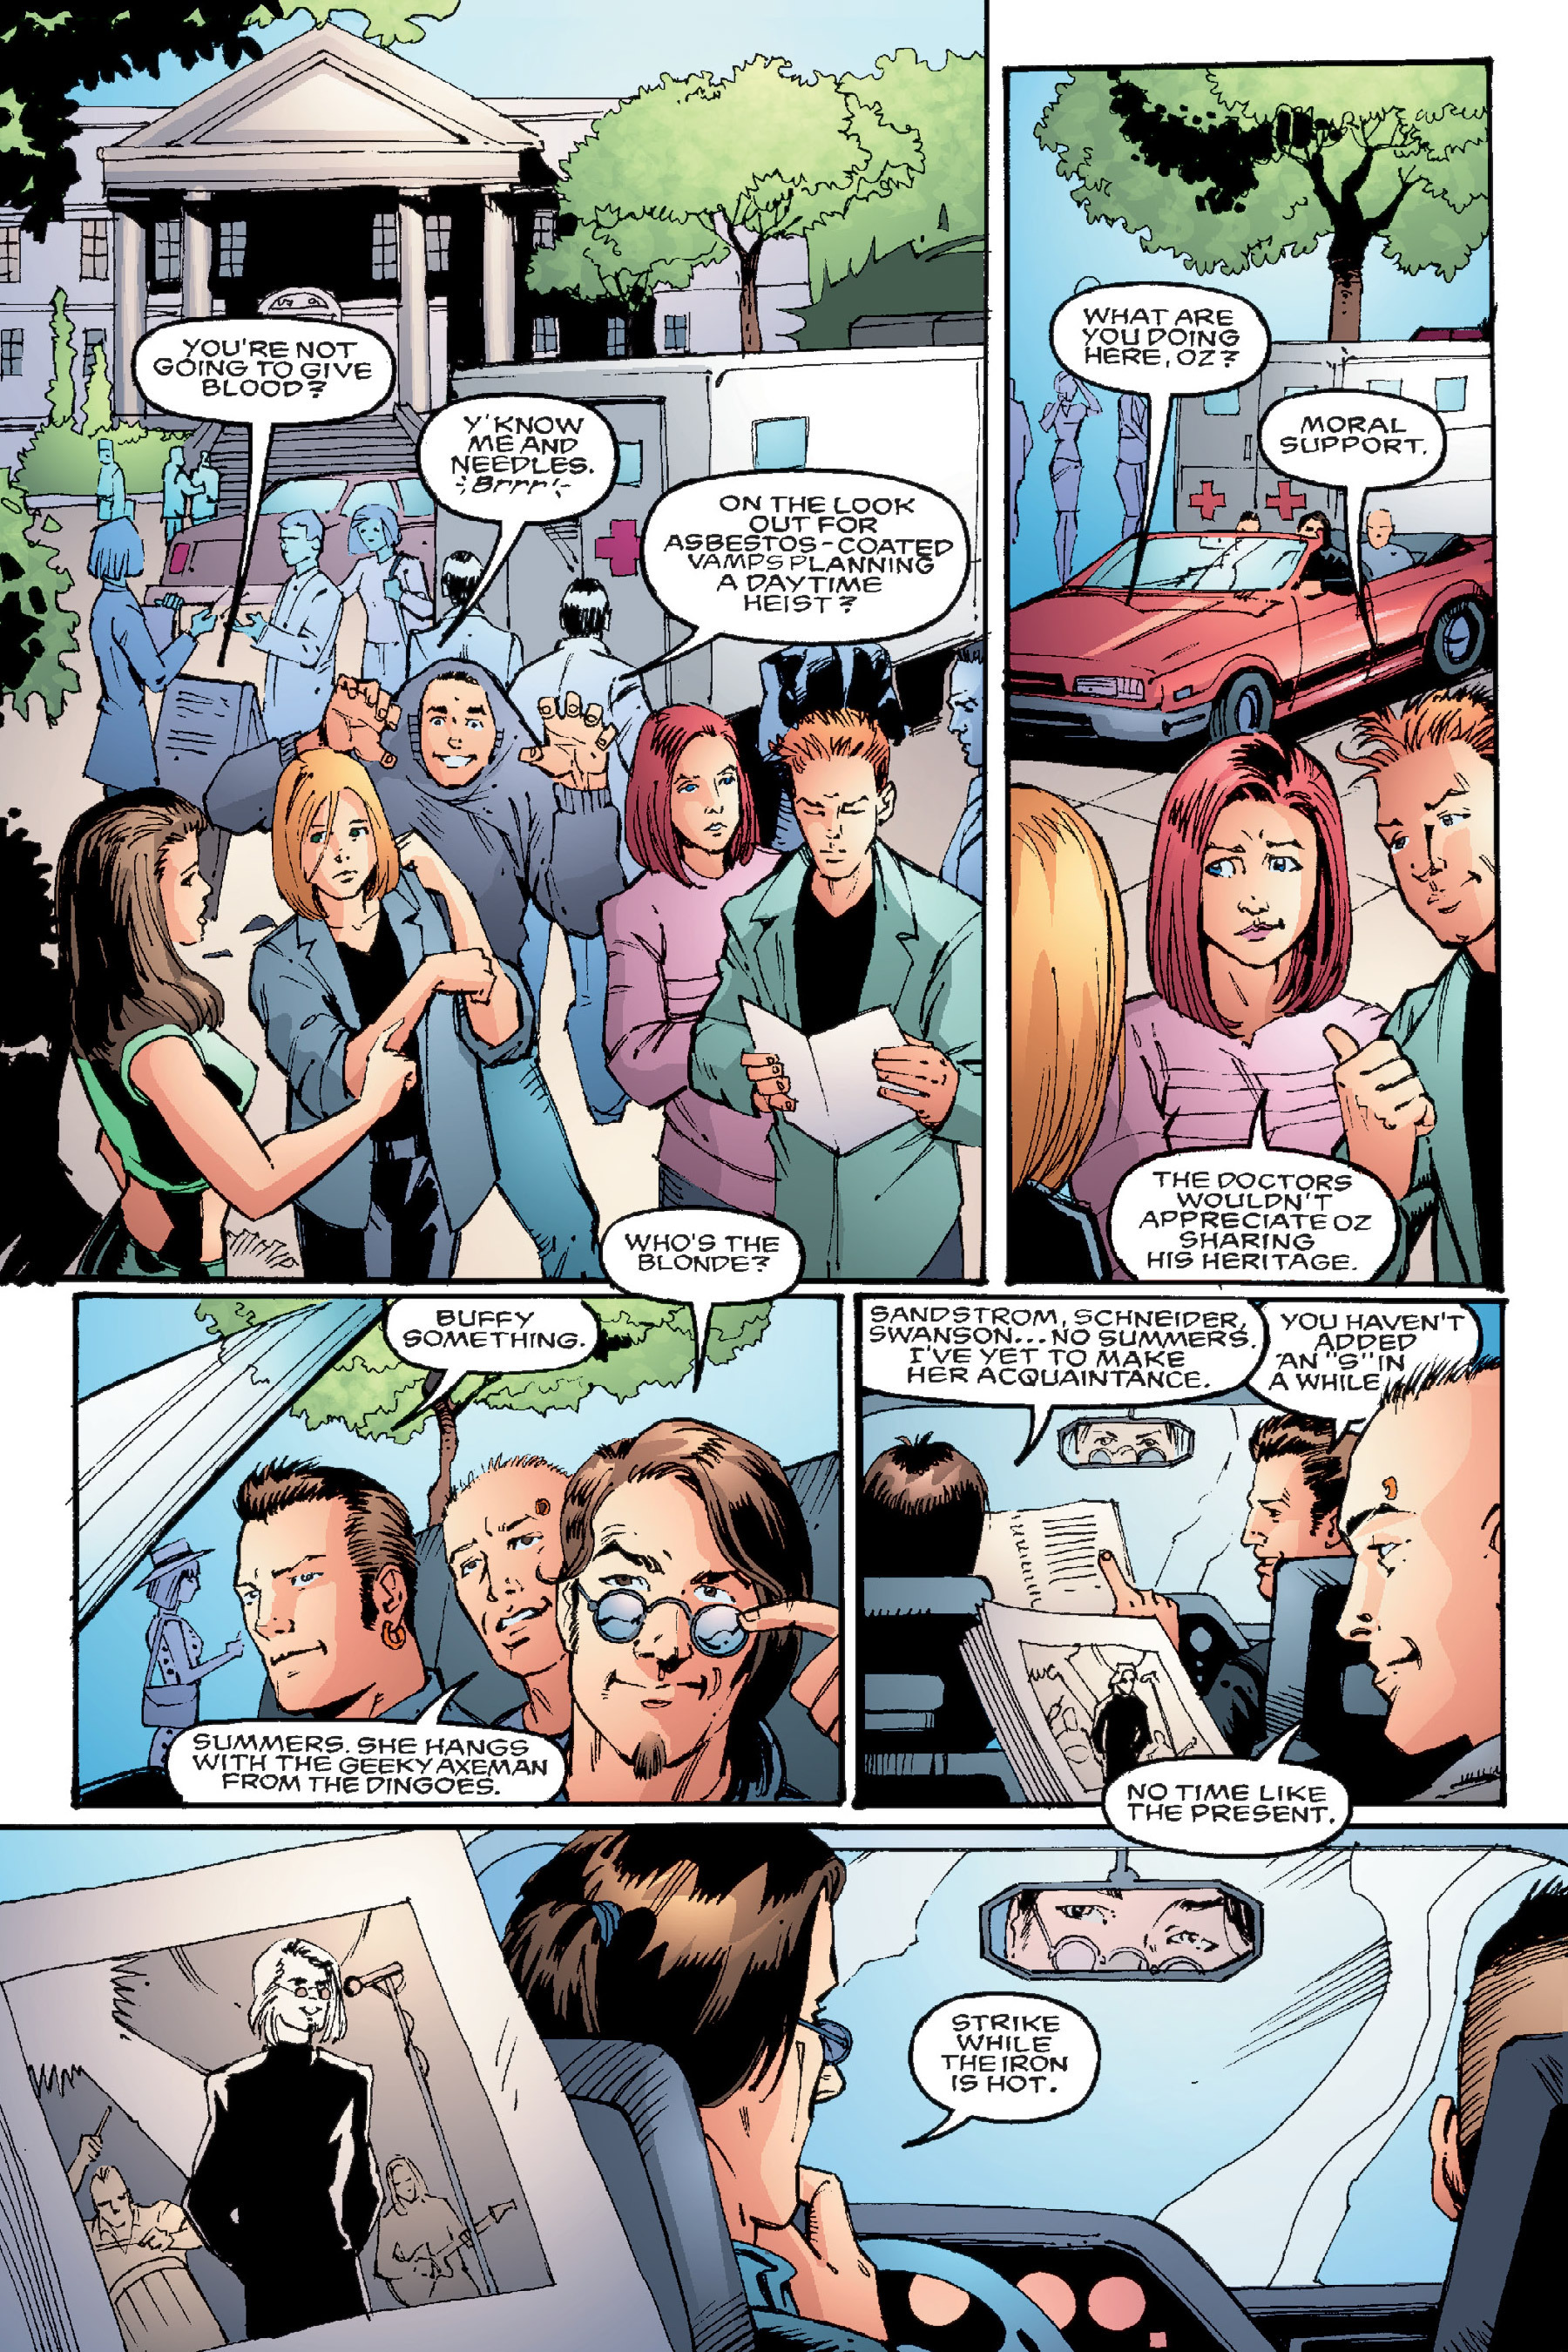 Read online Buffy the Vampire Slayer: Omnibus comic -  Issue # TPB 4 - 57